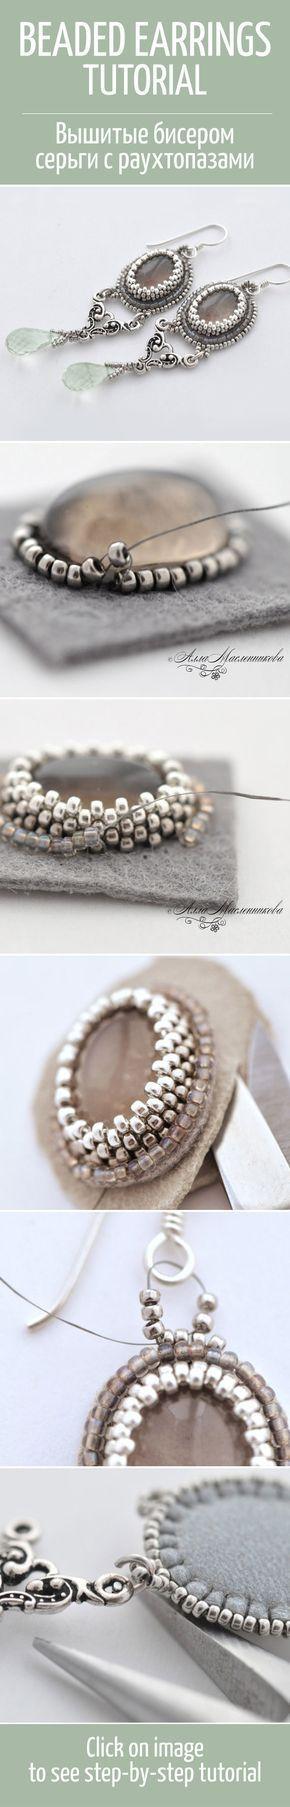 "Создаем серьги ""Novembre"" с раухтопазами и металлическими подвесками / Beaded earrings tutorial | Earrings | Pinterest | Beaded earrings, Earrings and Earring …"